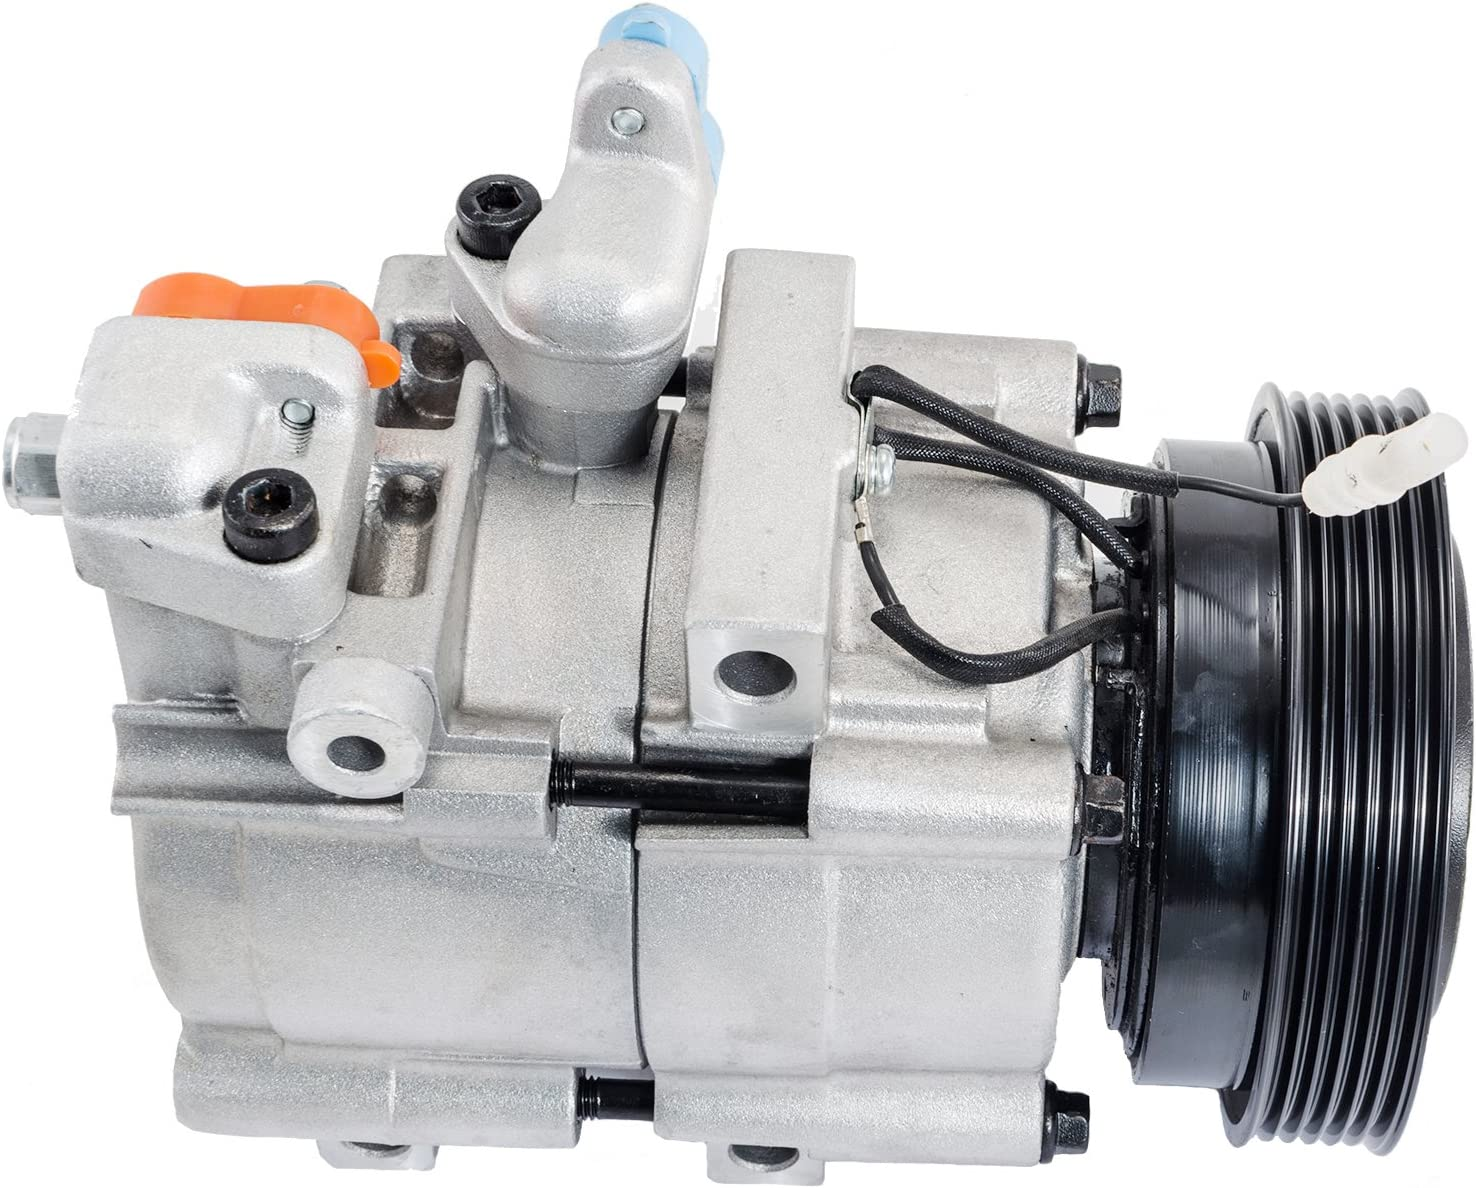 AC A//C Compressor for Hyundai Santa Fe 2.7L 2001-2006